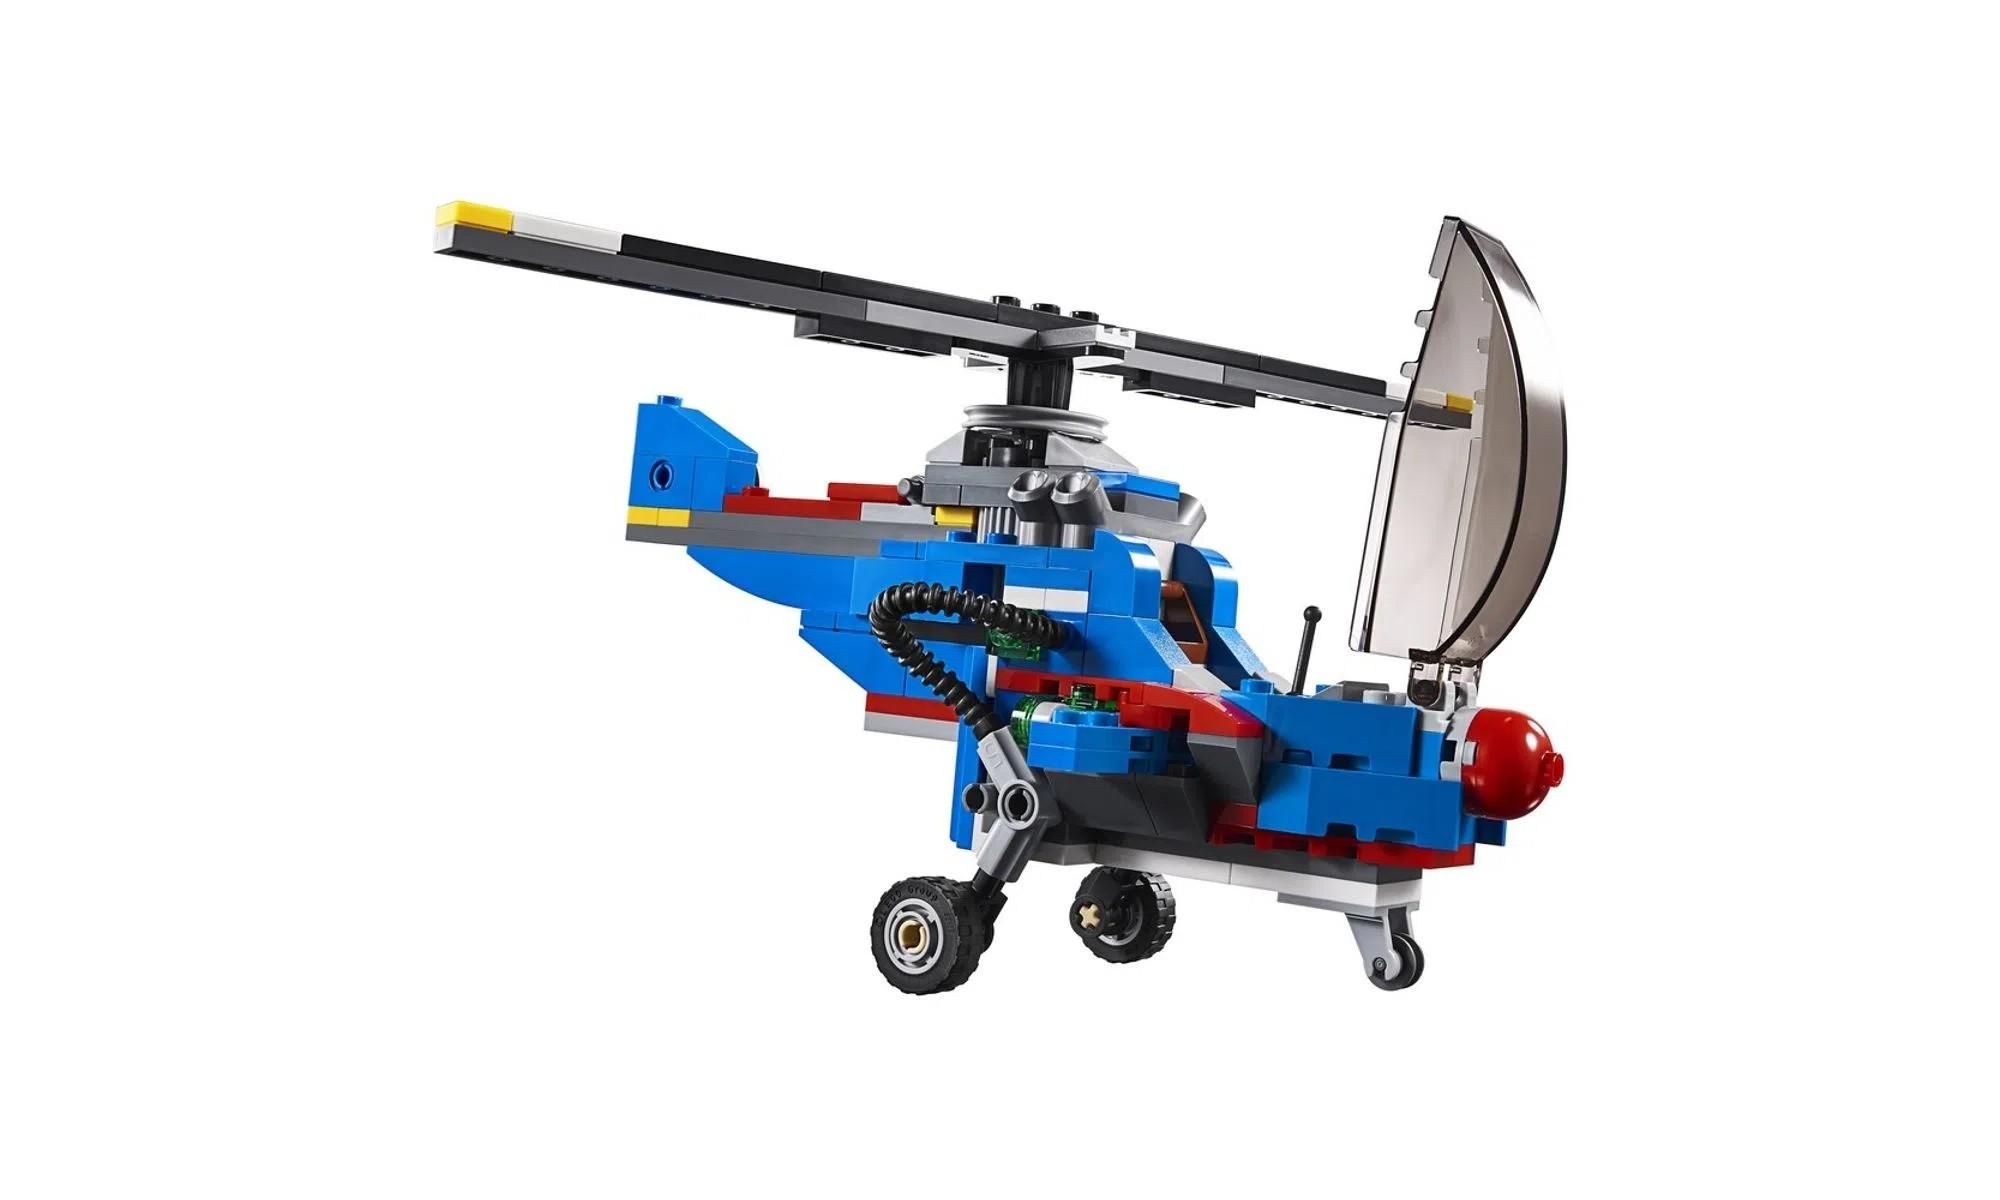 LEGO Creator - Modelo 3 Em 1: Aeronaves de Corrida 31094